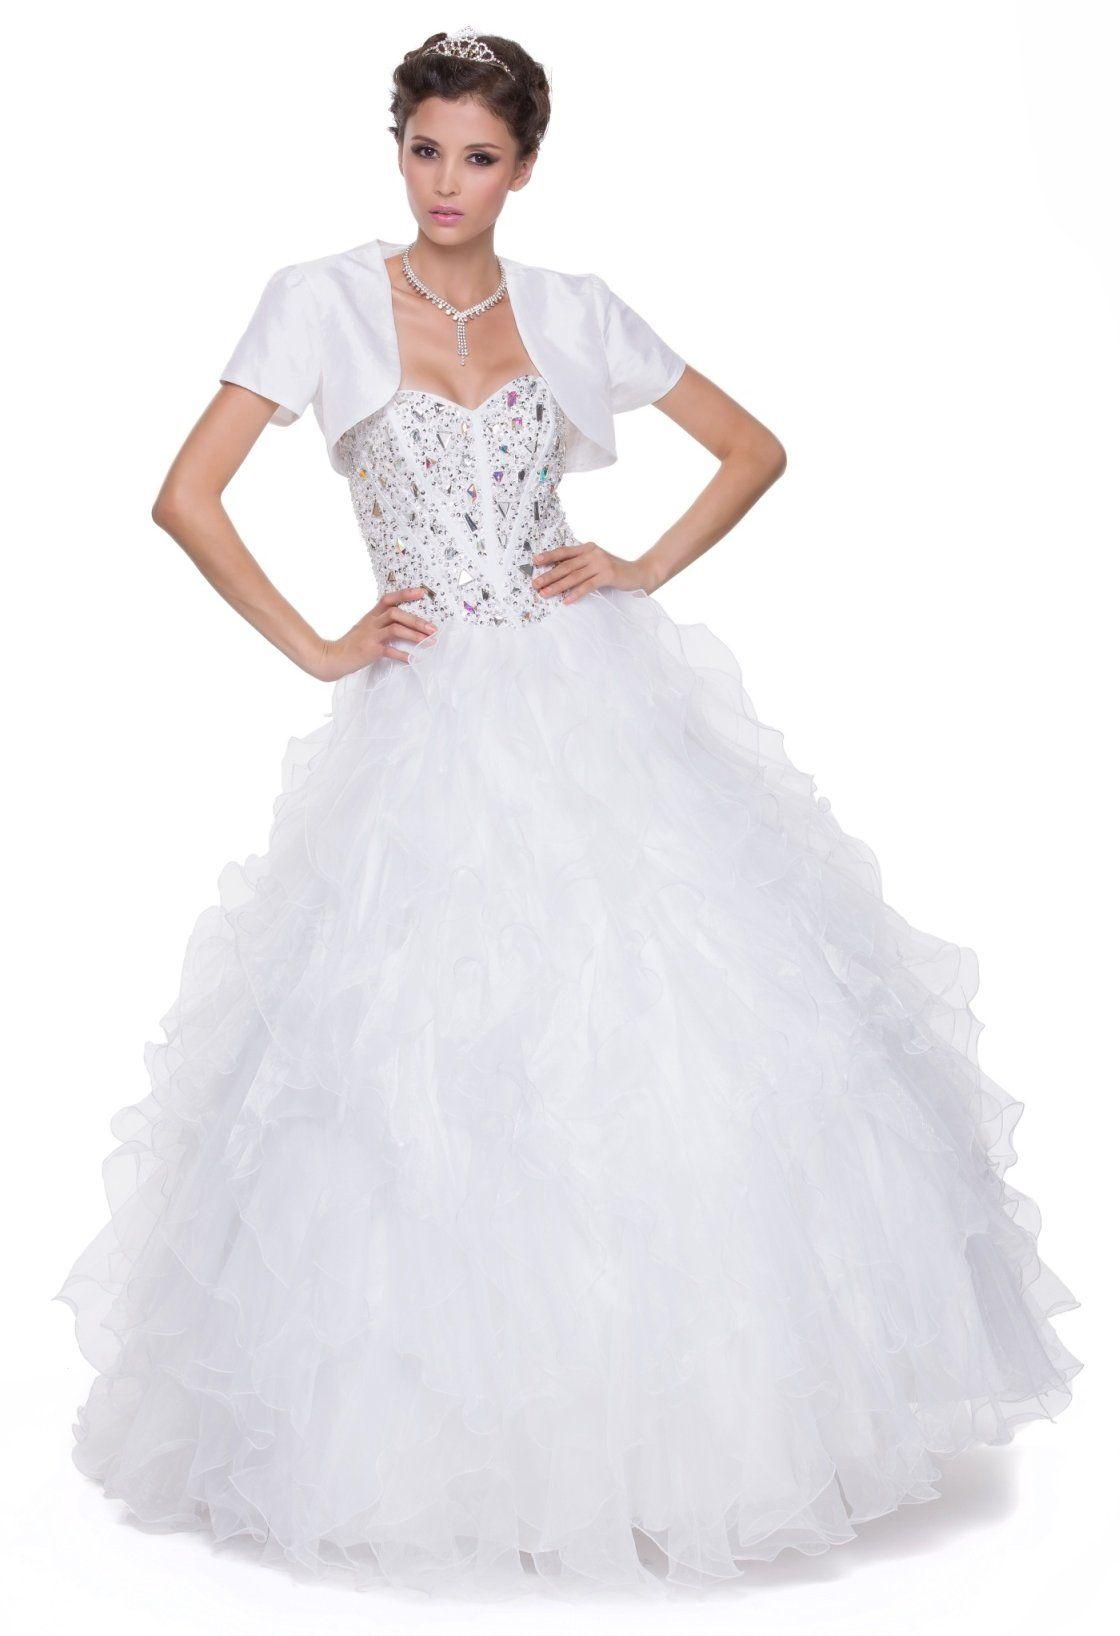 44+ Poofy wedding dresses pinterest information